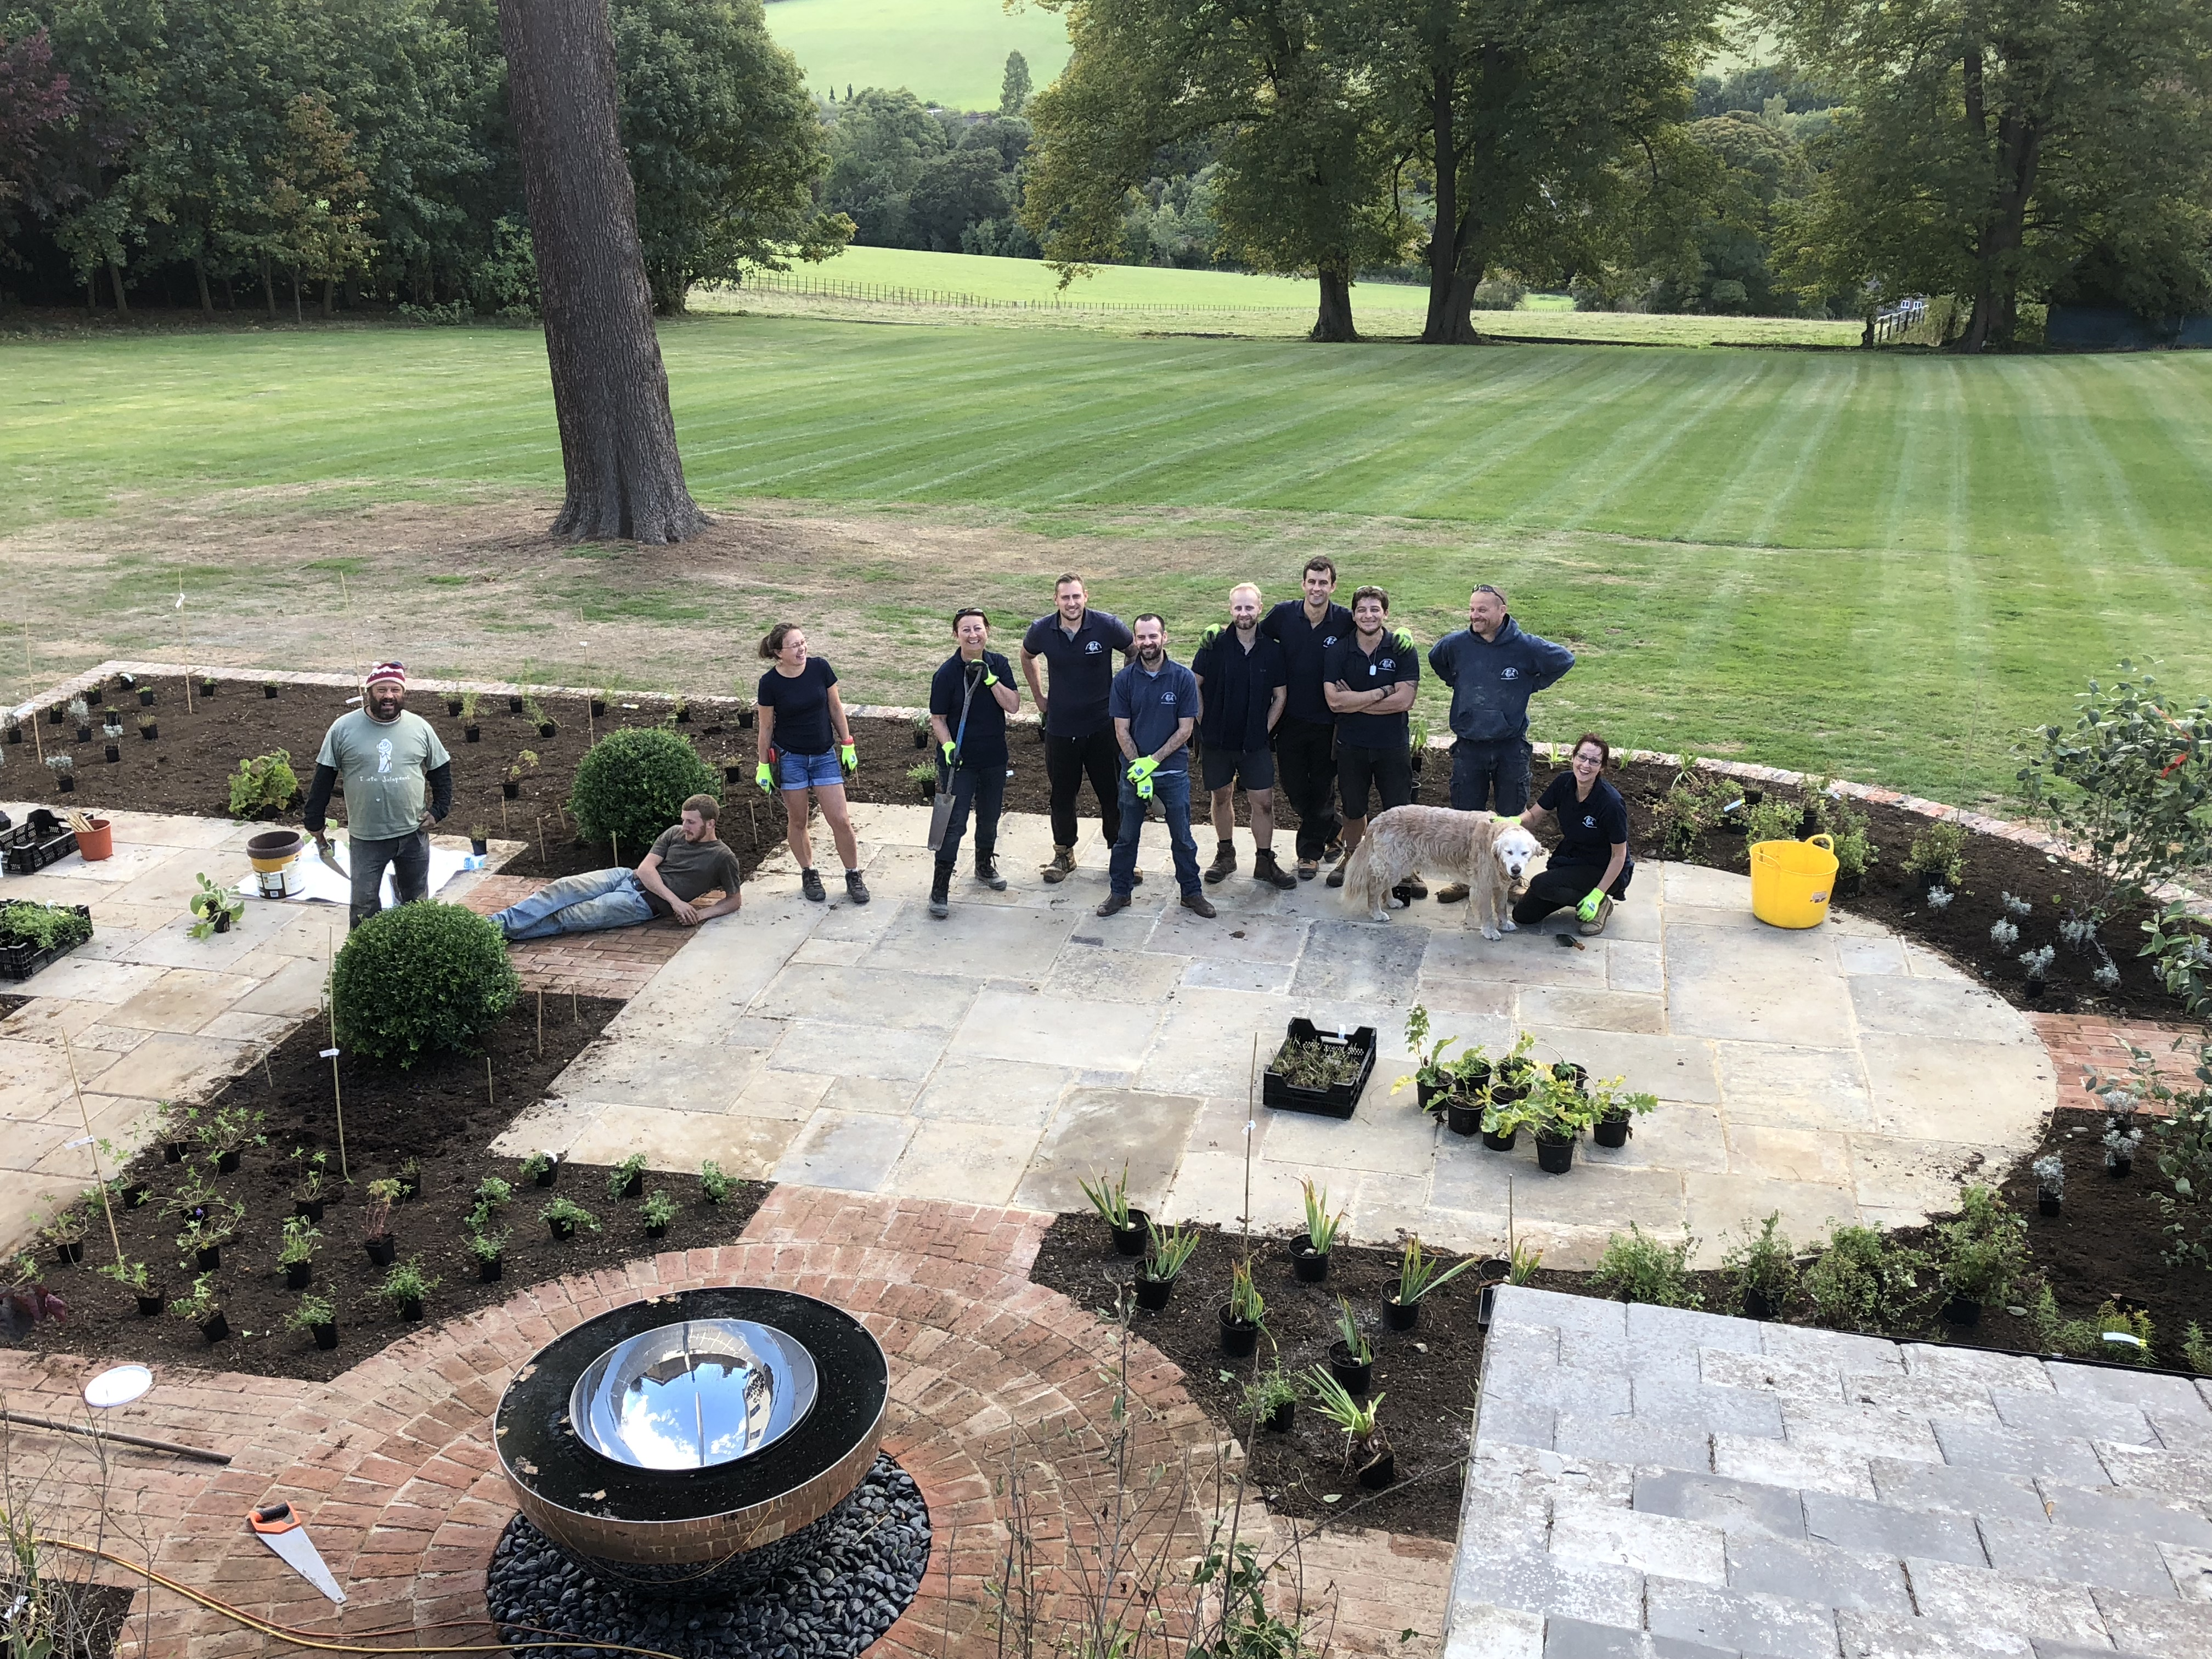 Garden Company team members